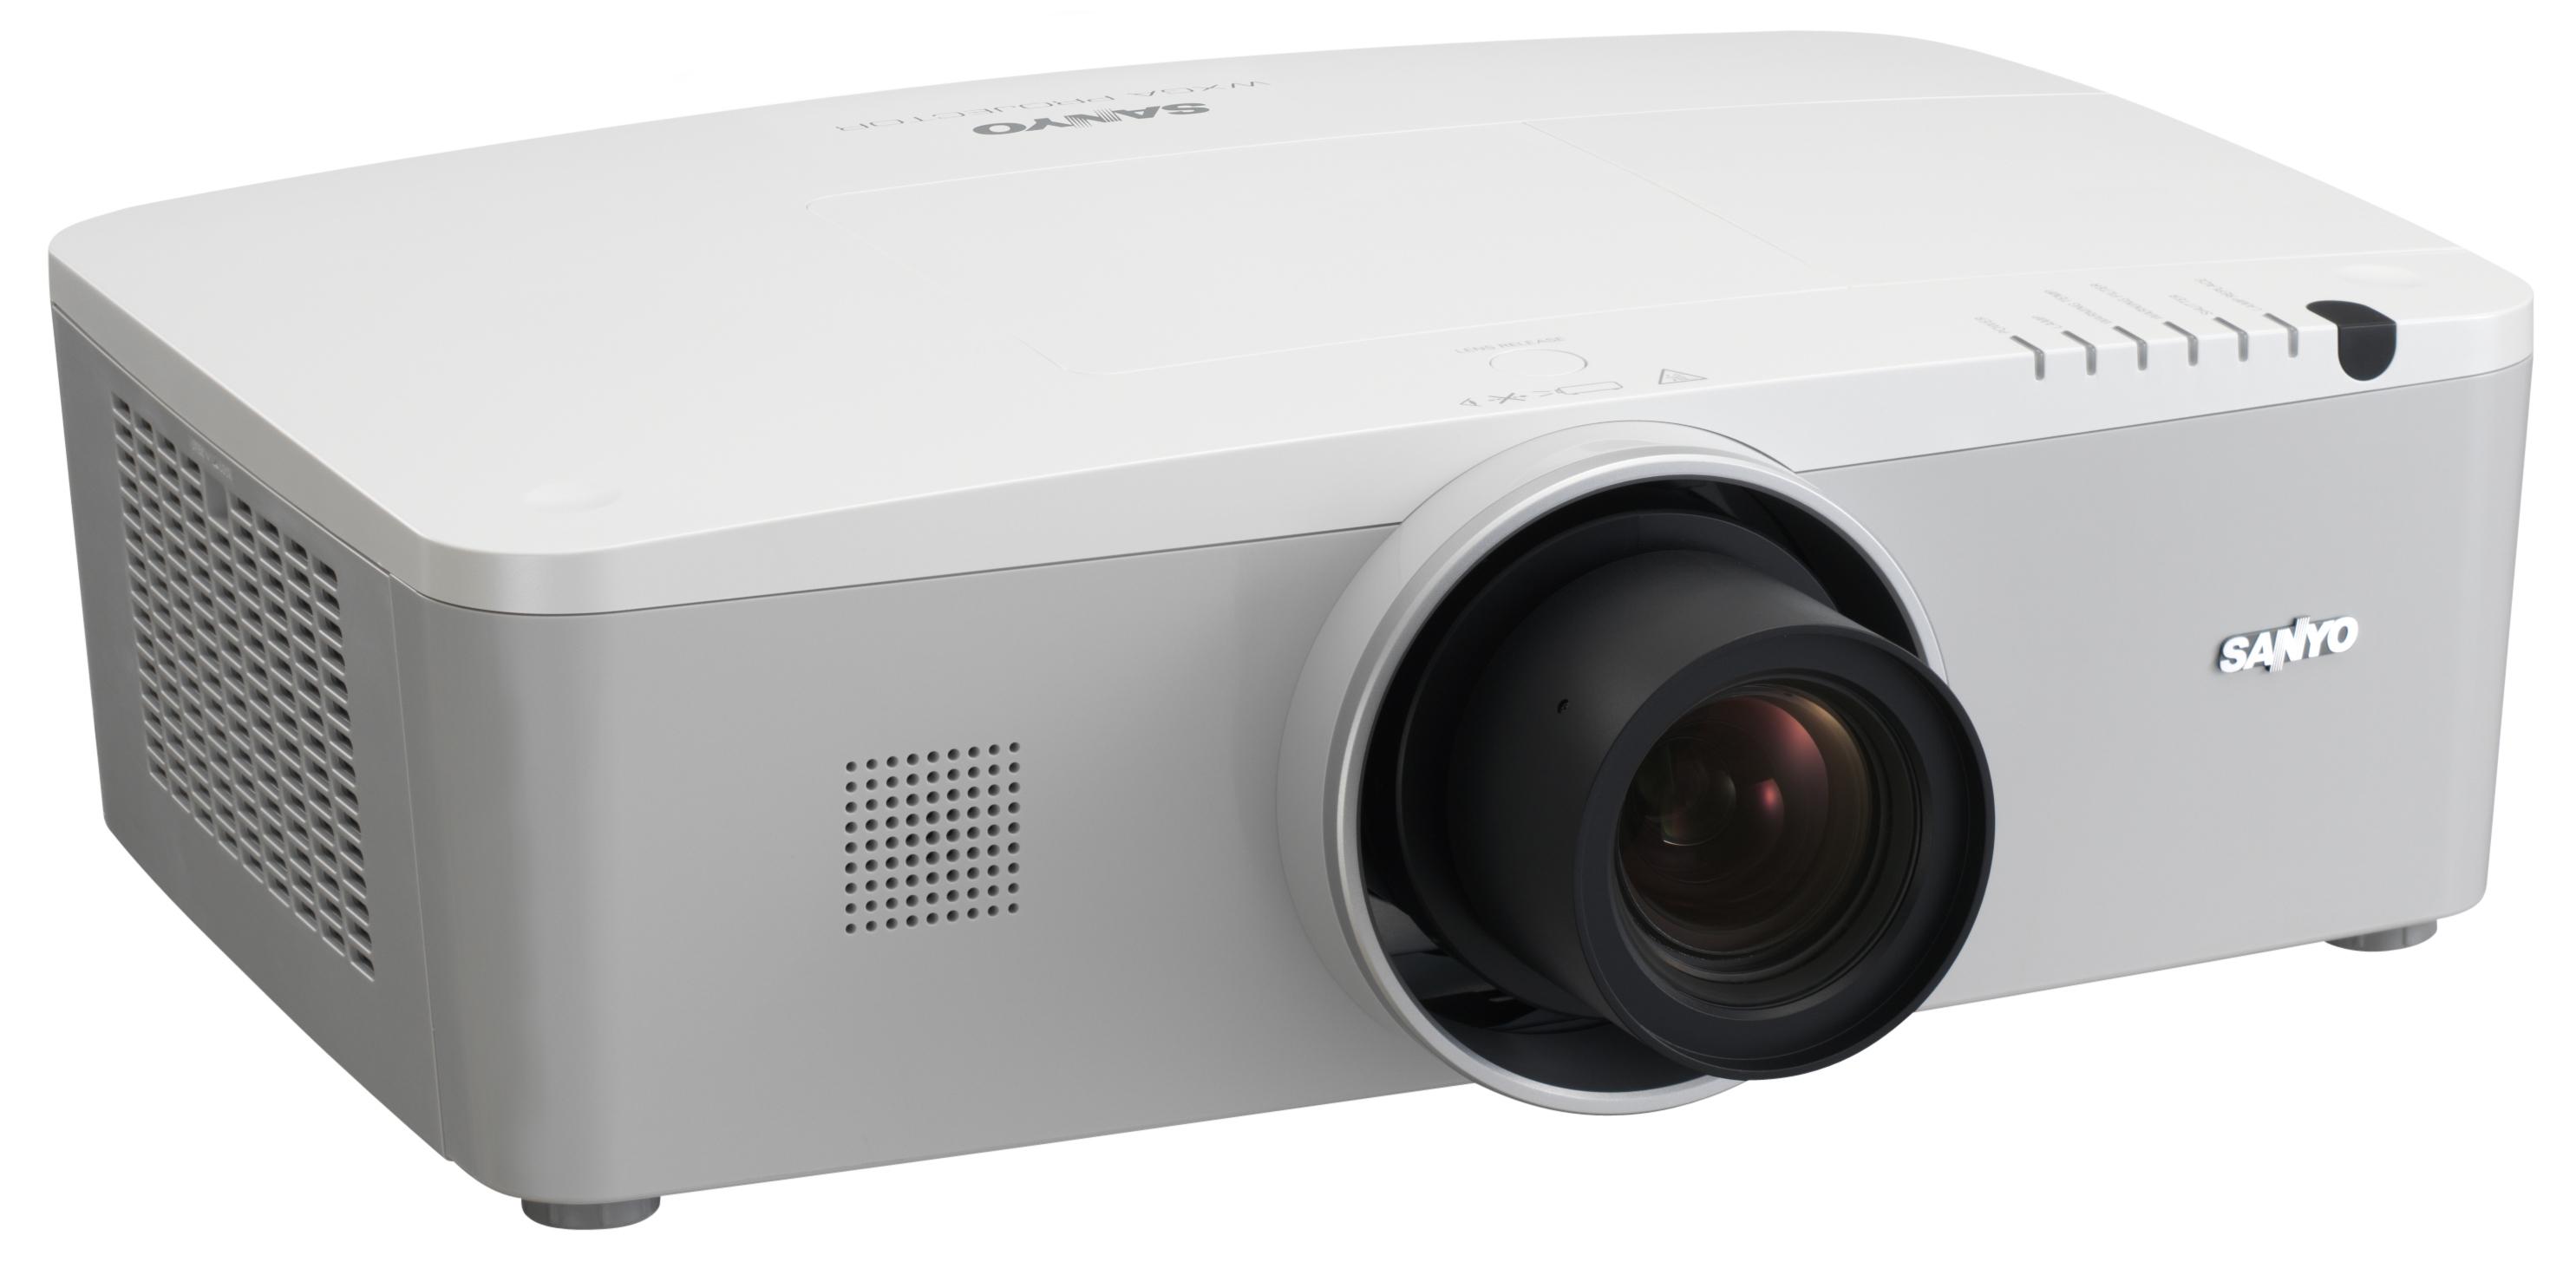 Uitgelezene Sanyo Projektoren: Sanyo PLC WM5500/L/S WXGA LCD Beamer KA-45